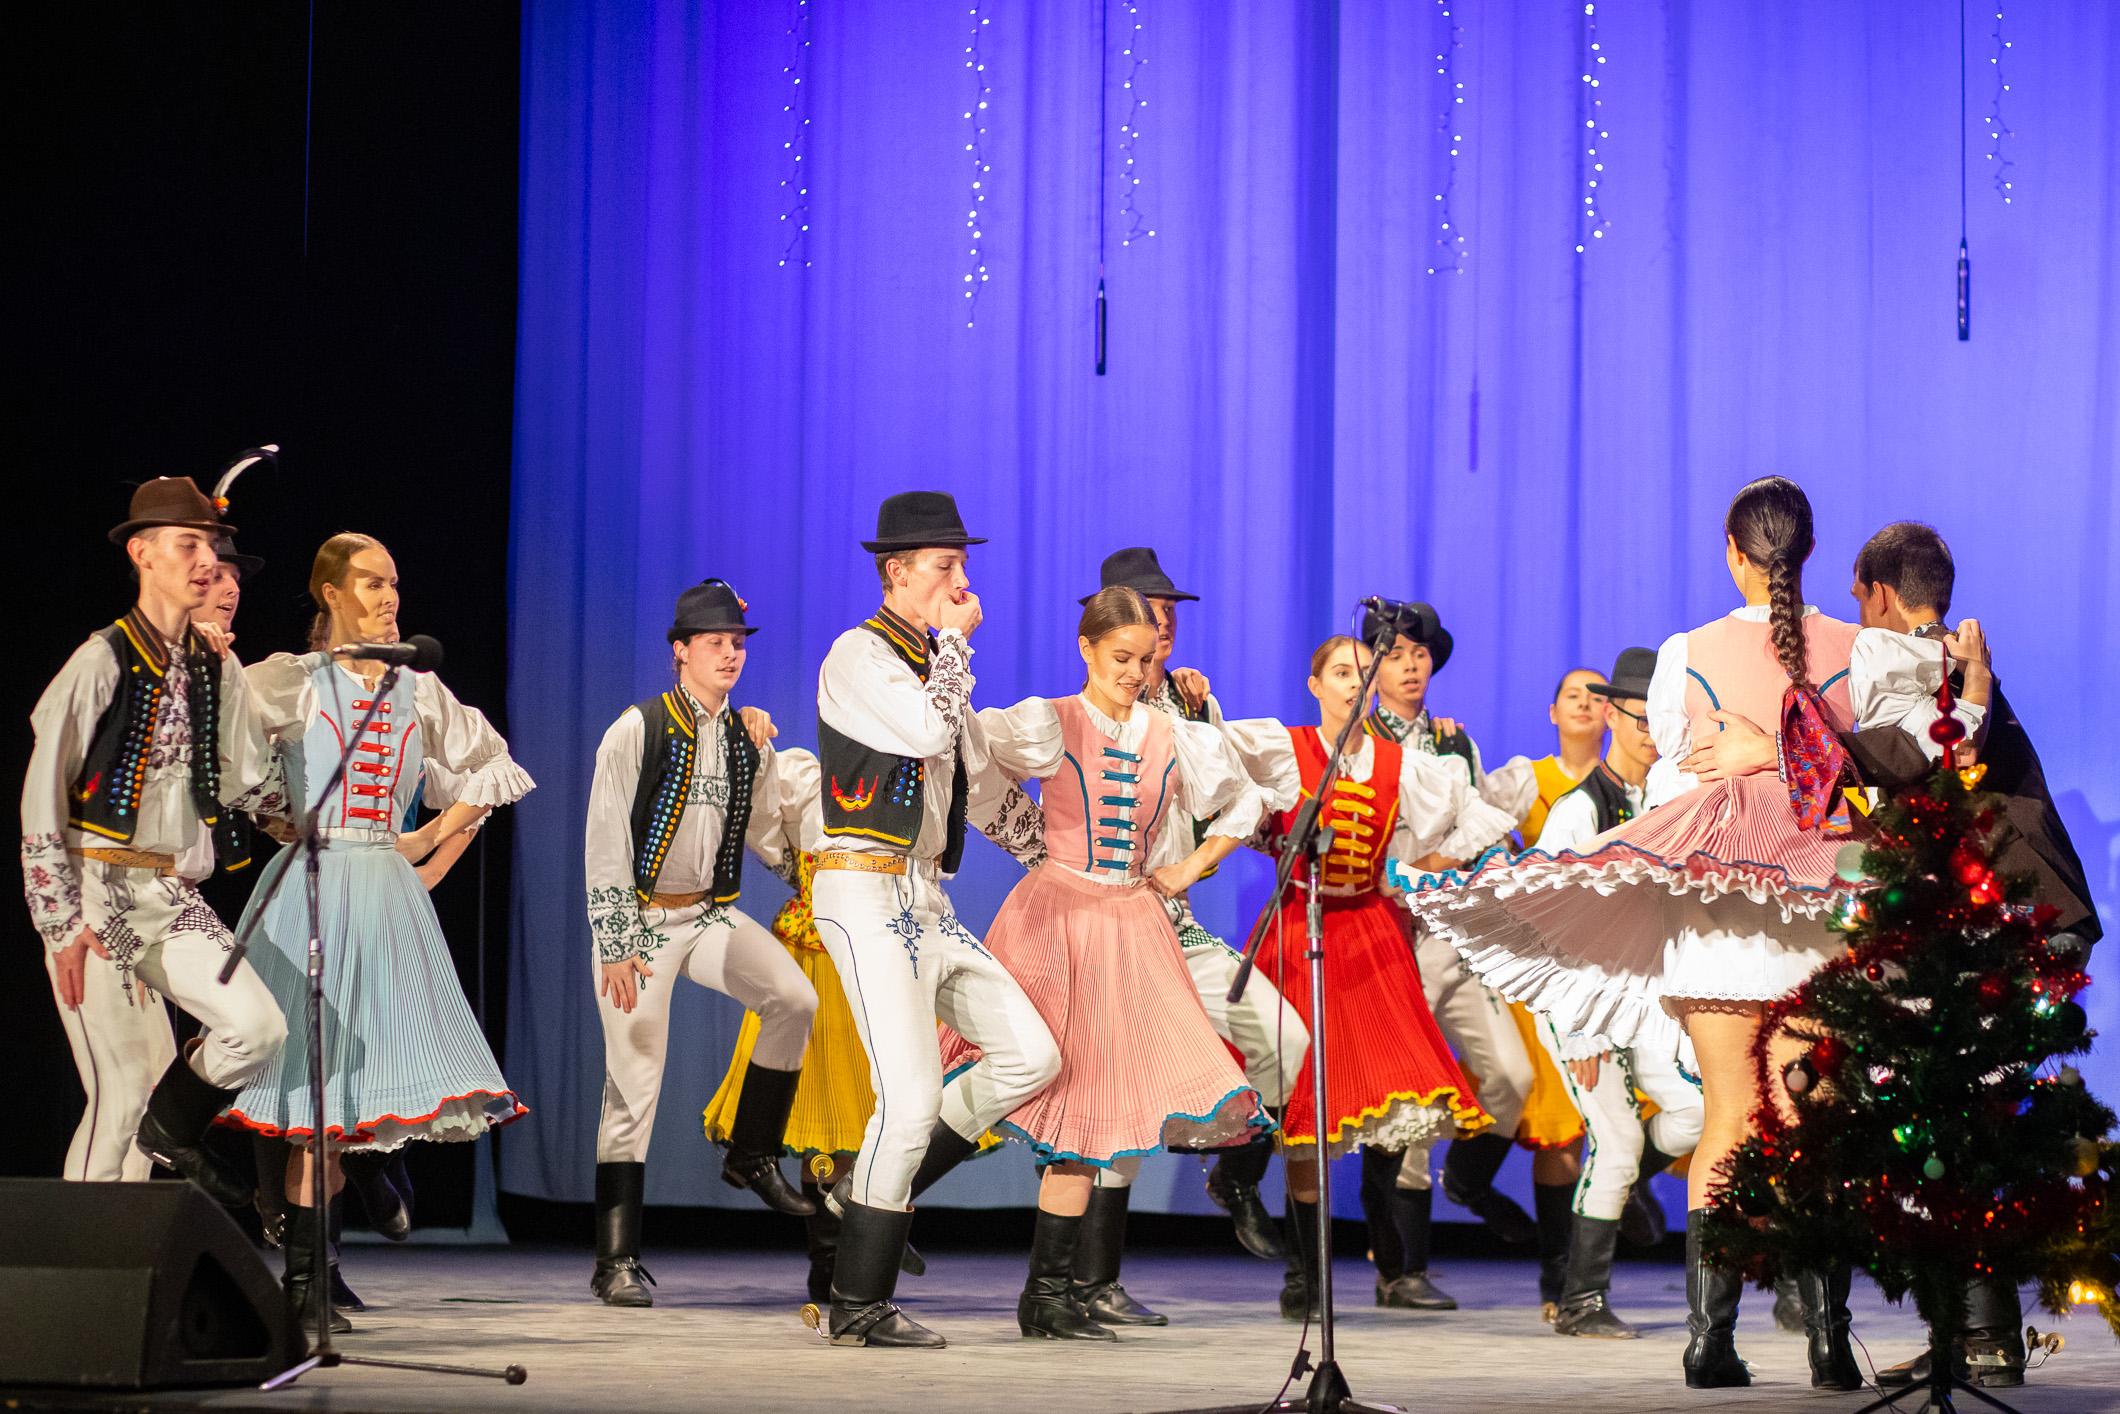 nadych-vianoc-zornicka-marina-18